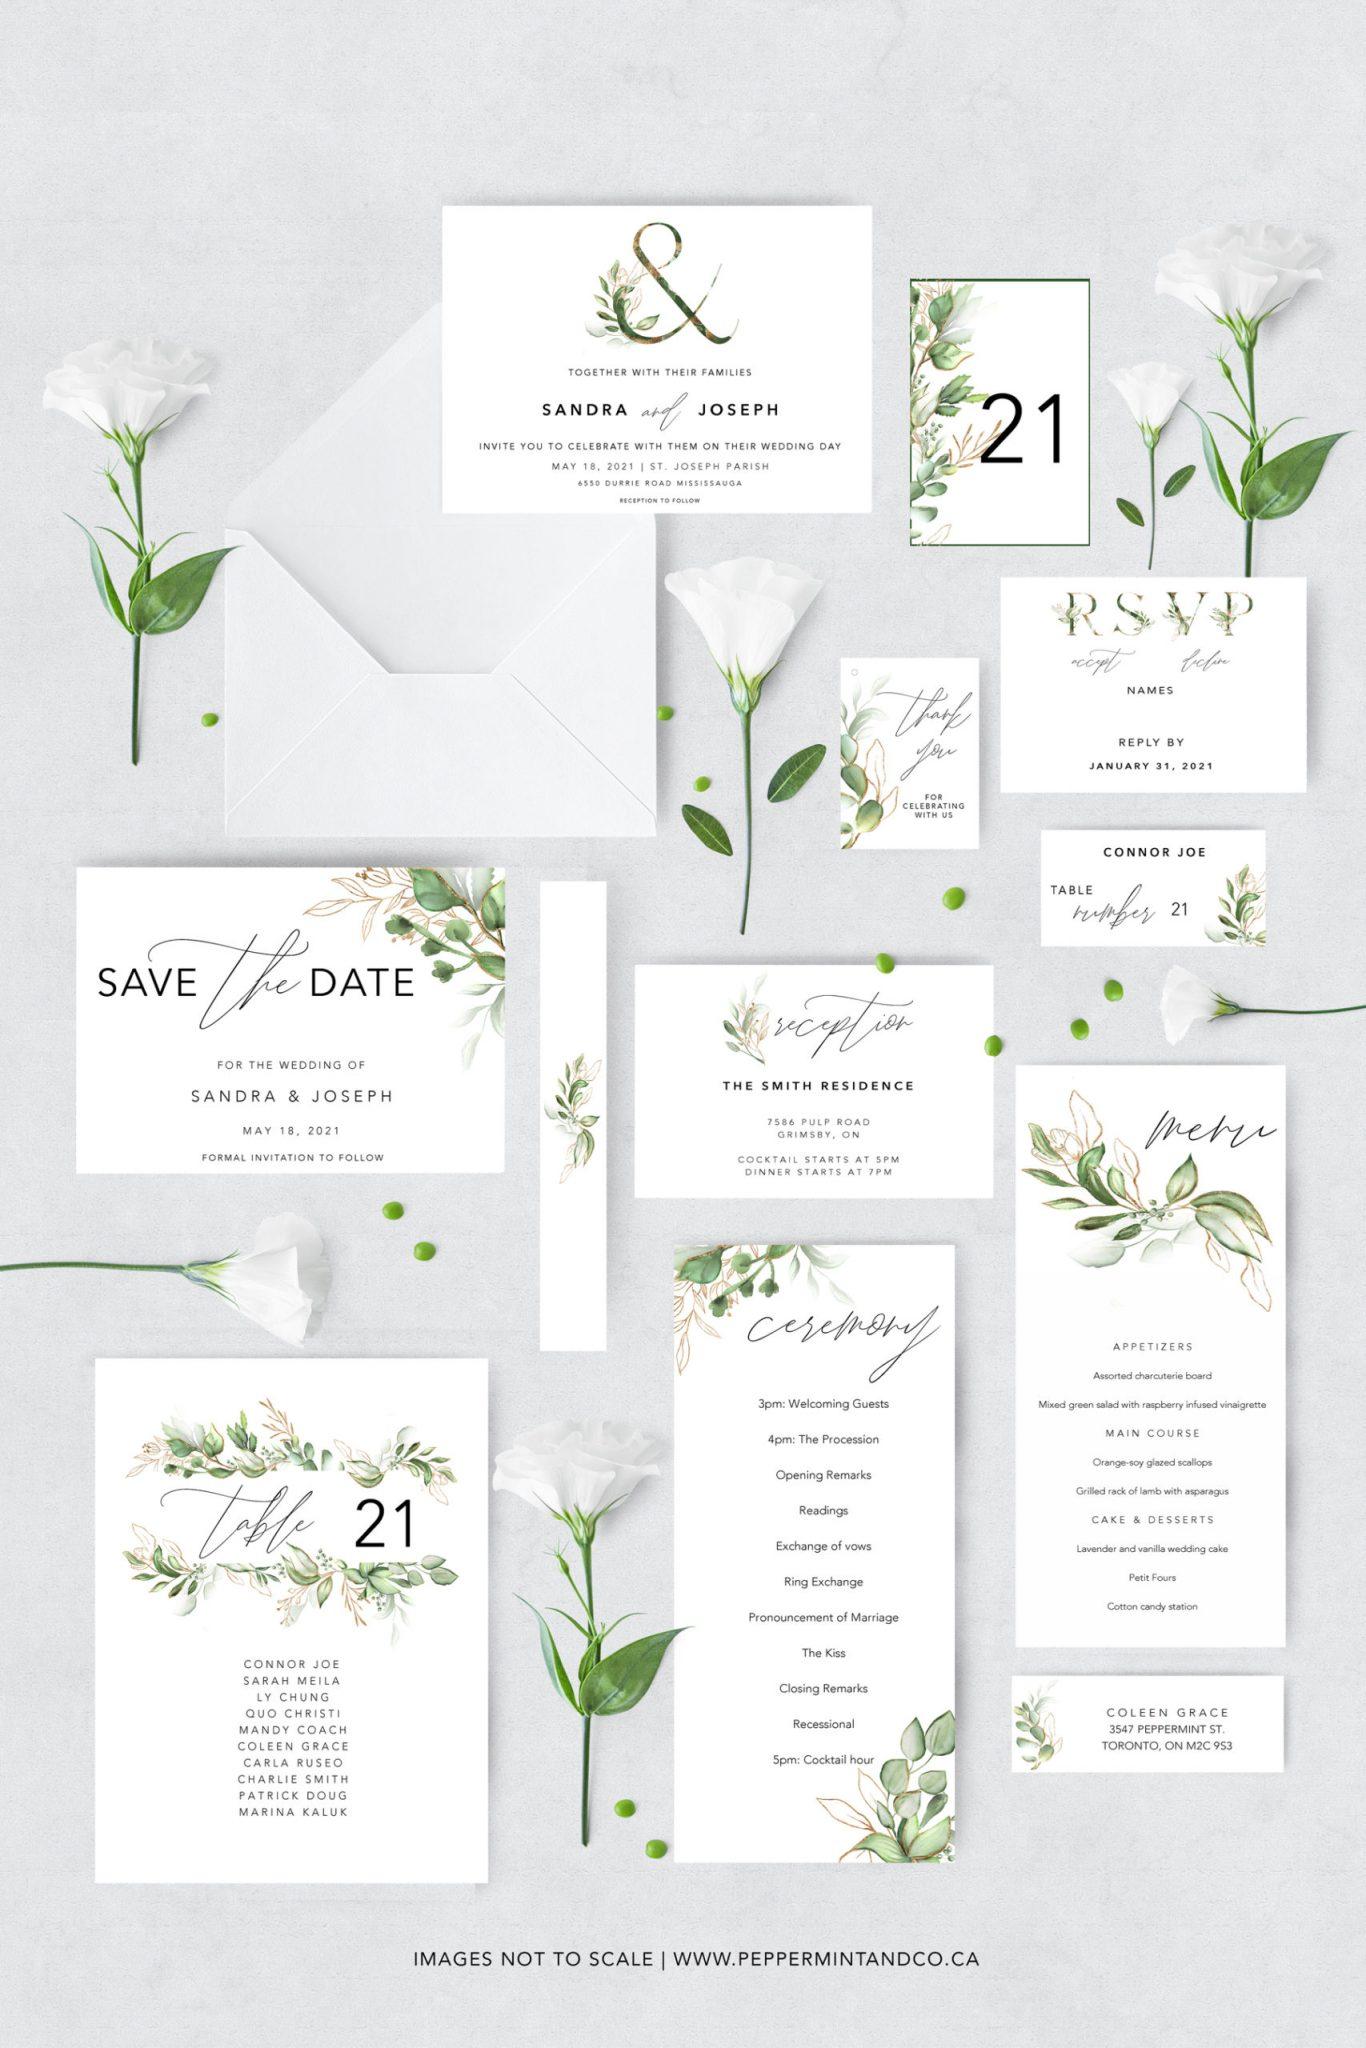 FREE WEDDING PRINTABLES: Planning Binder, Invitation Suite and Minimalist Signs - 23